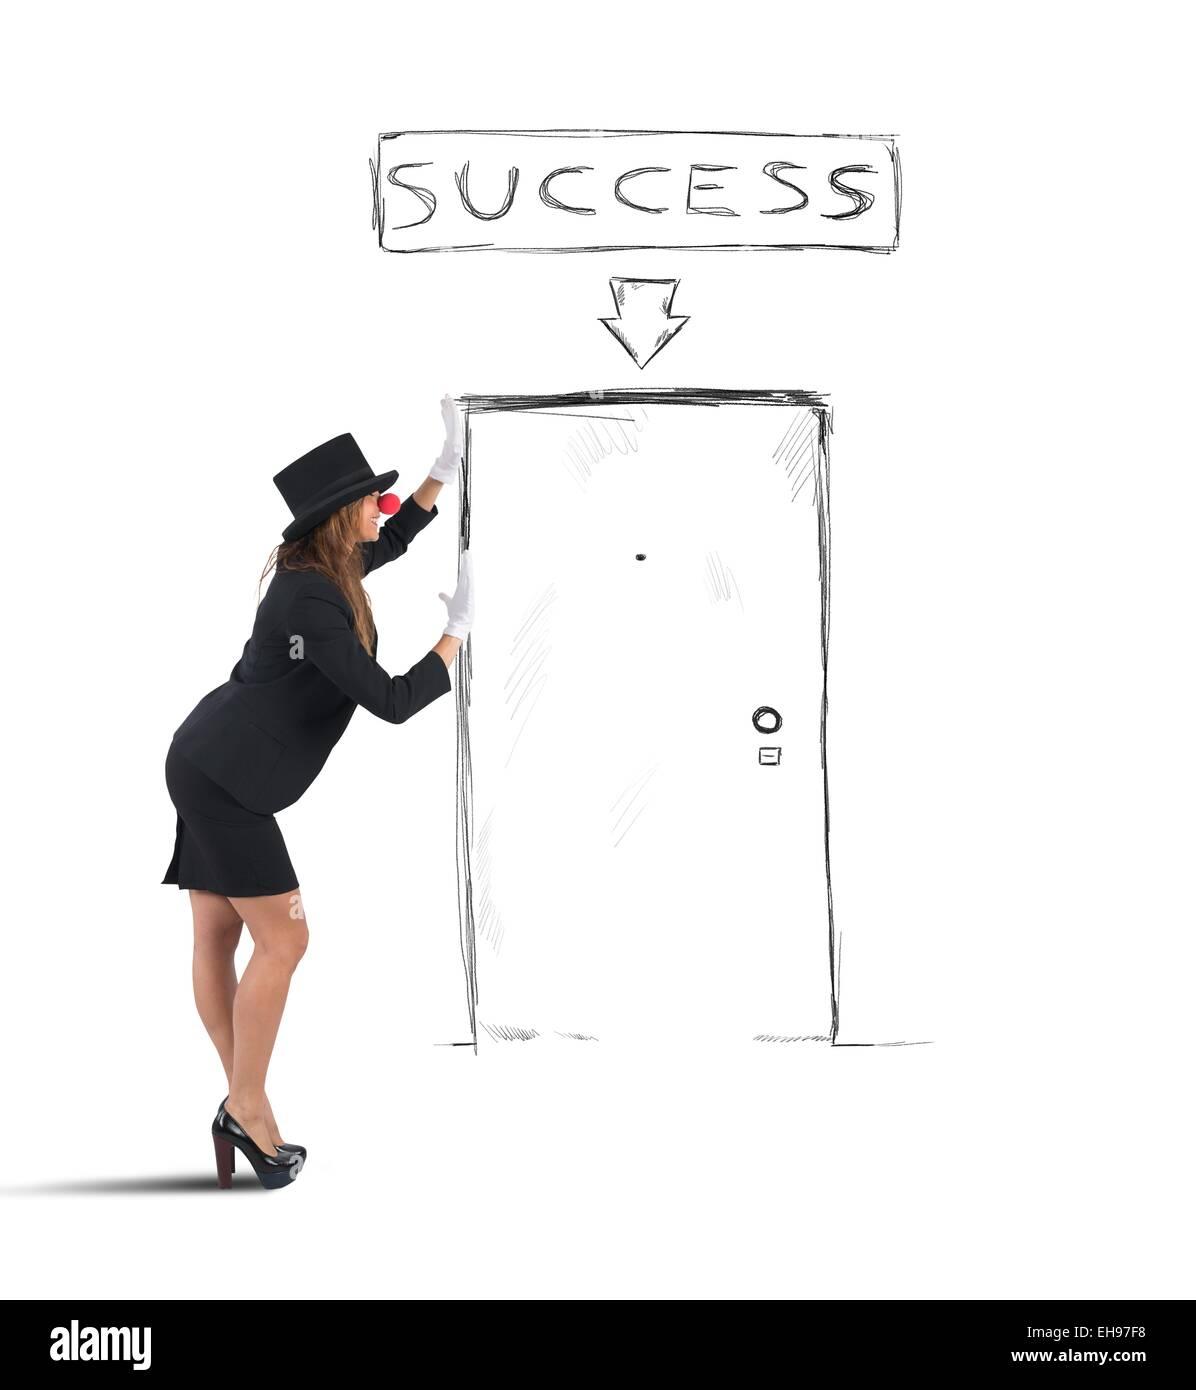 Mime businesswoman success - Stock Image